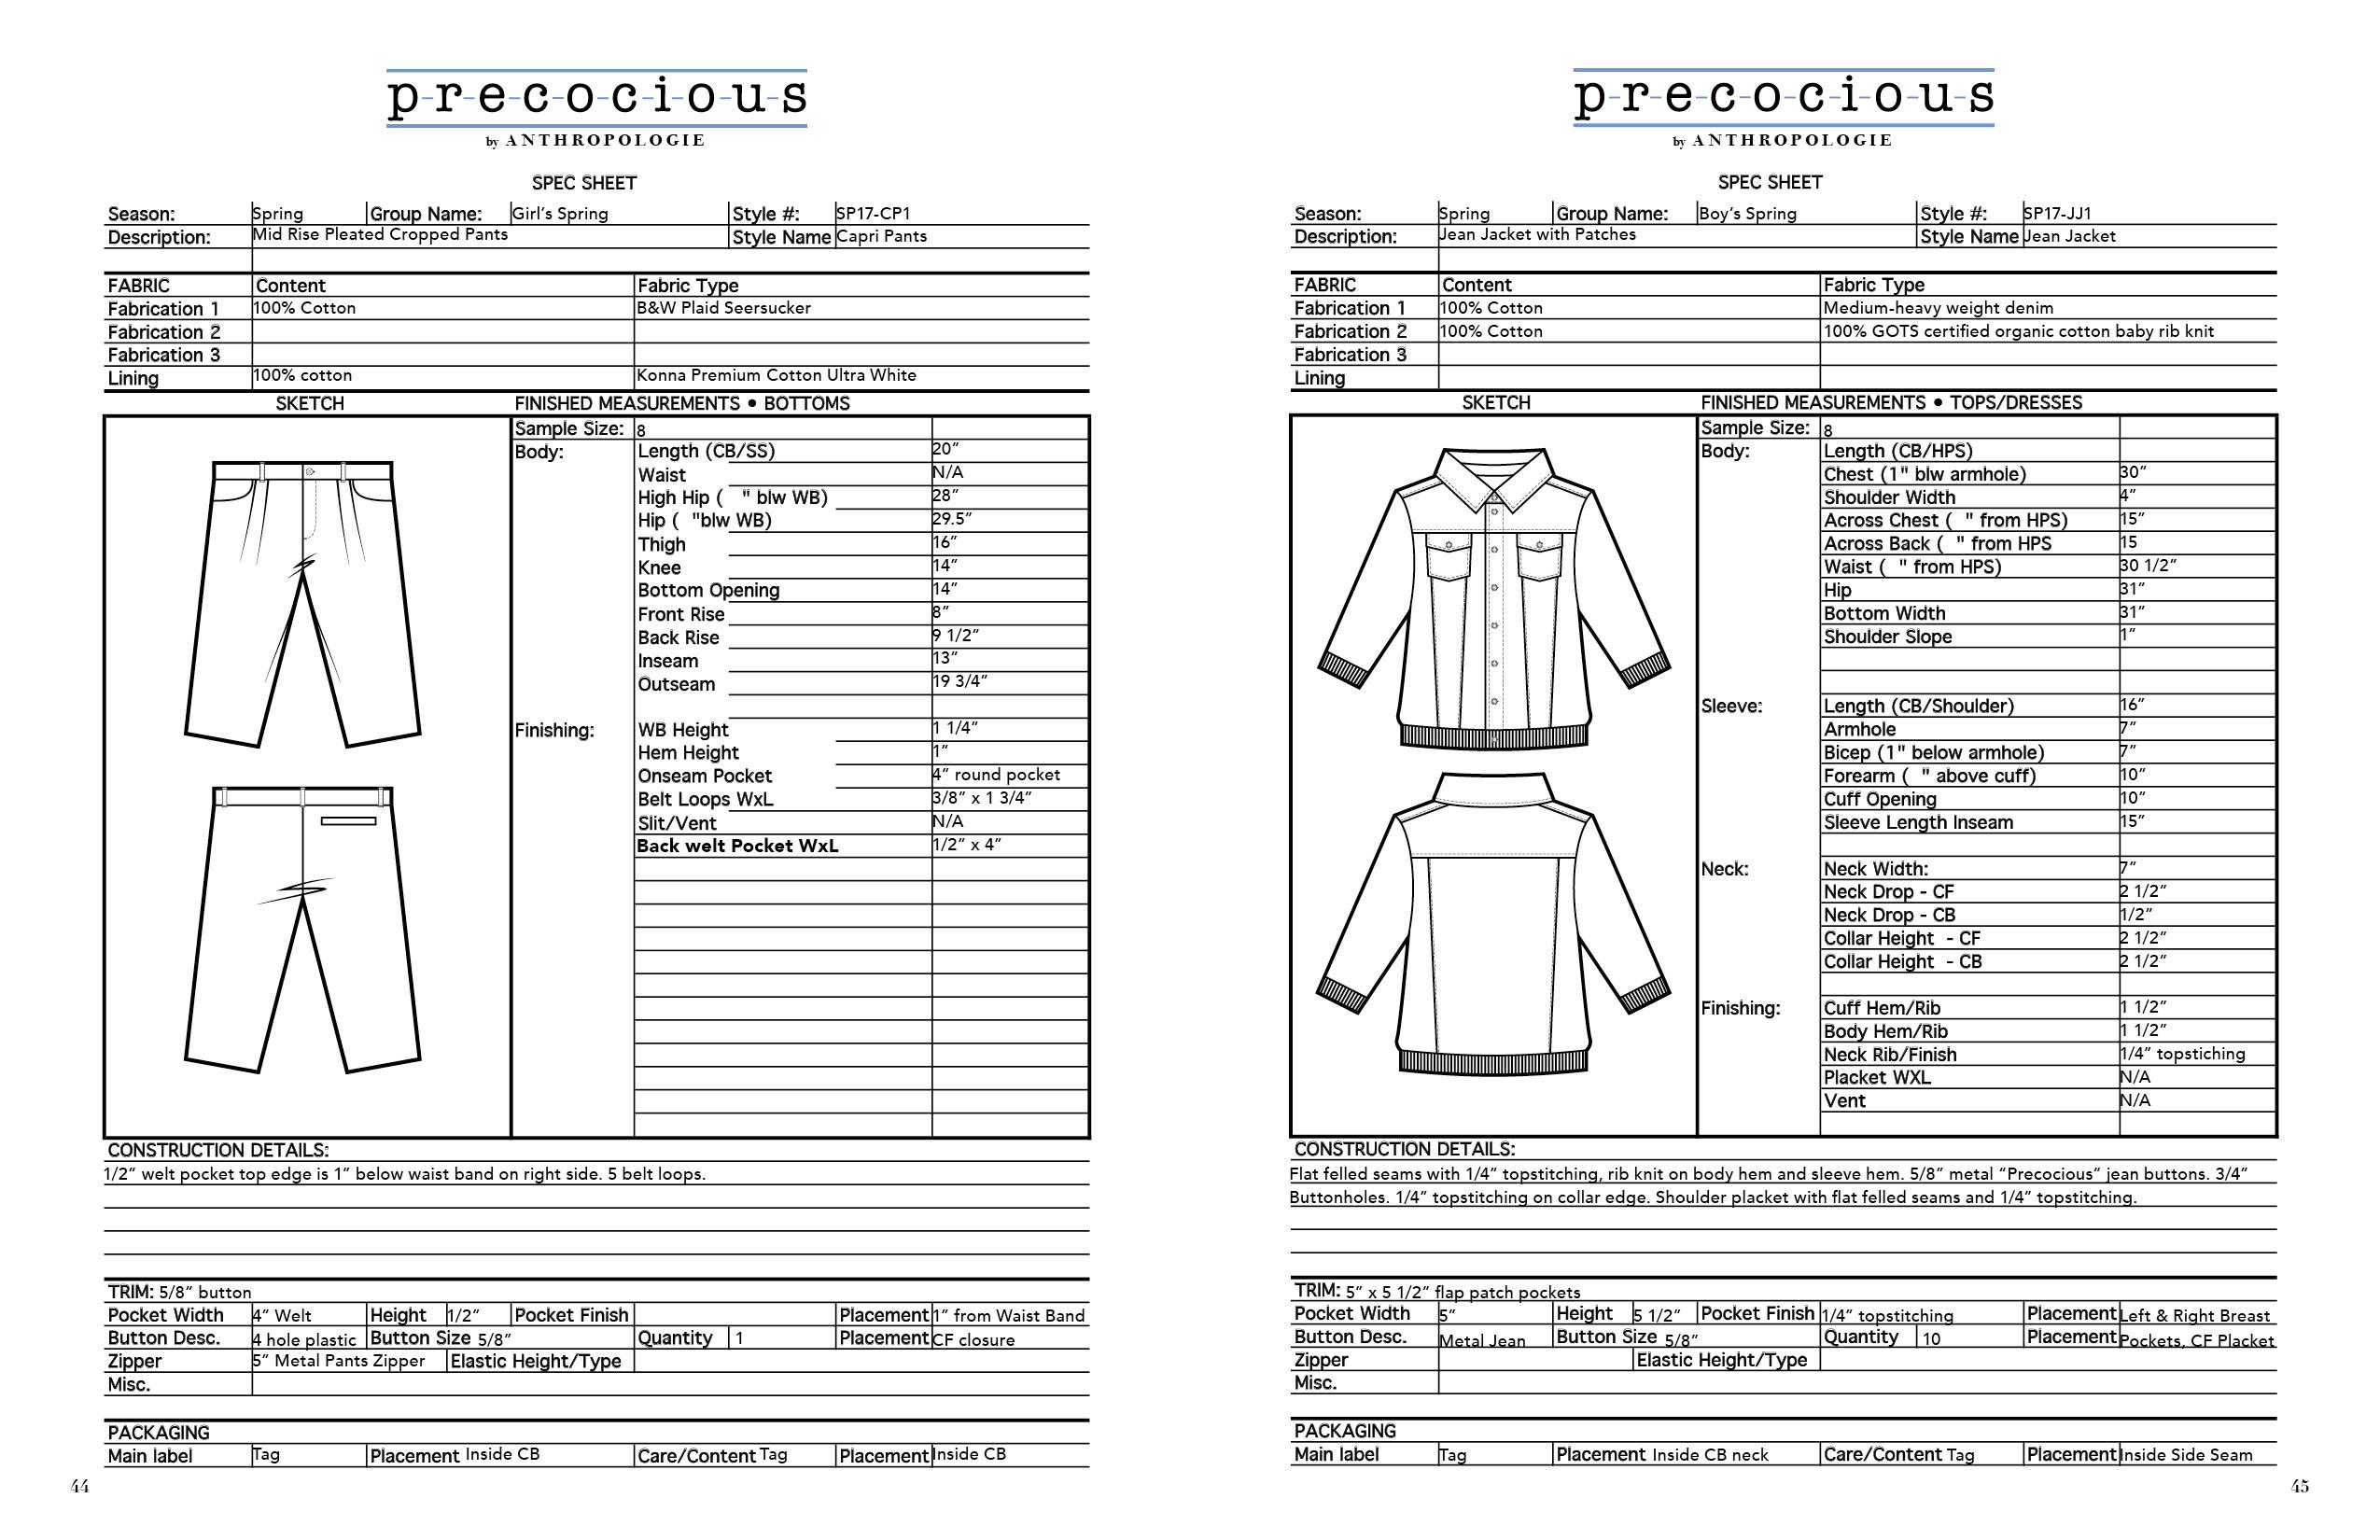 Precocious Product Development Line Extension Spec Sheets